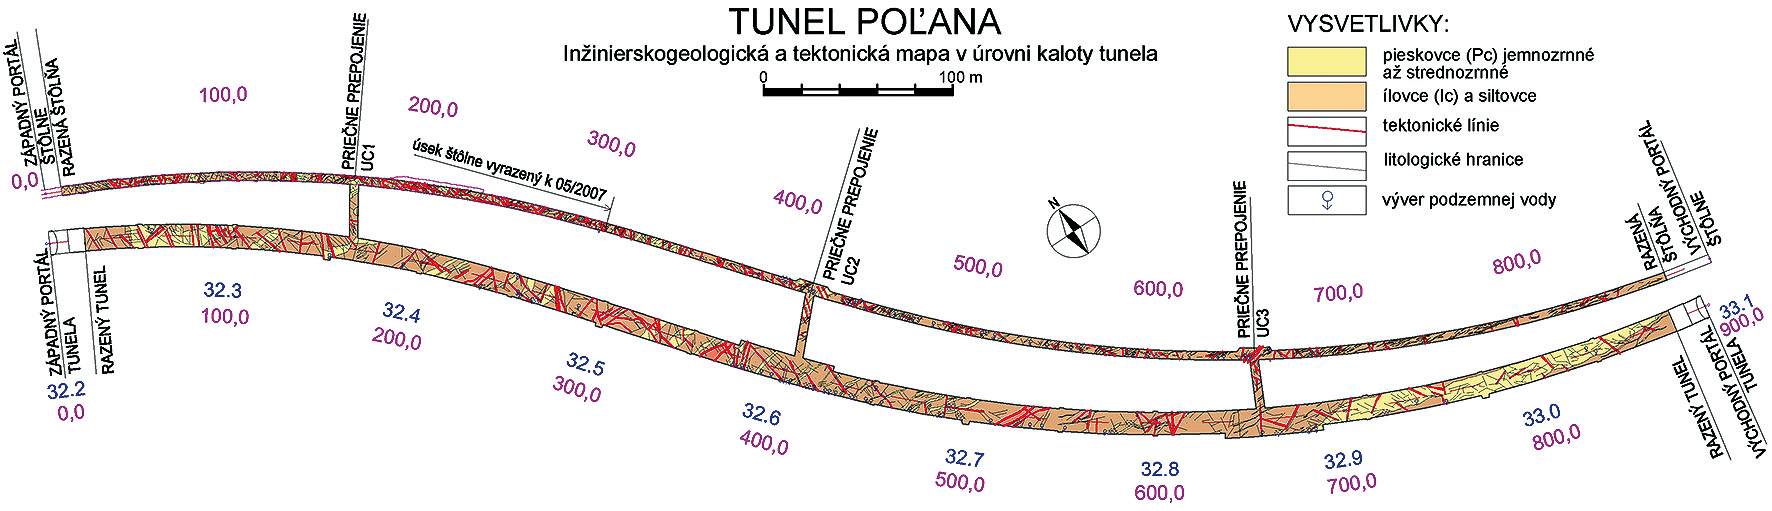 01 banska mapa Polana pre clanok